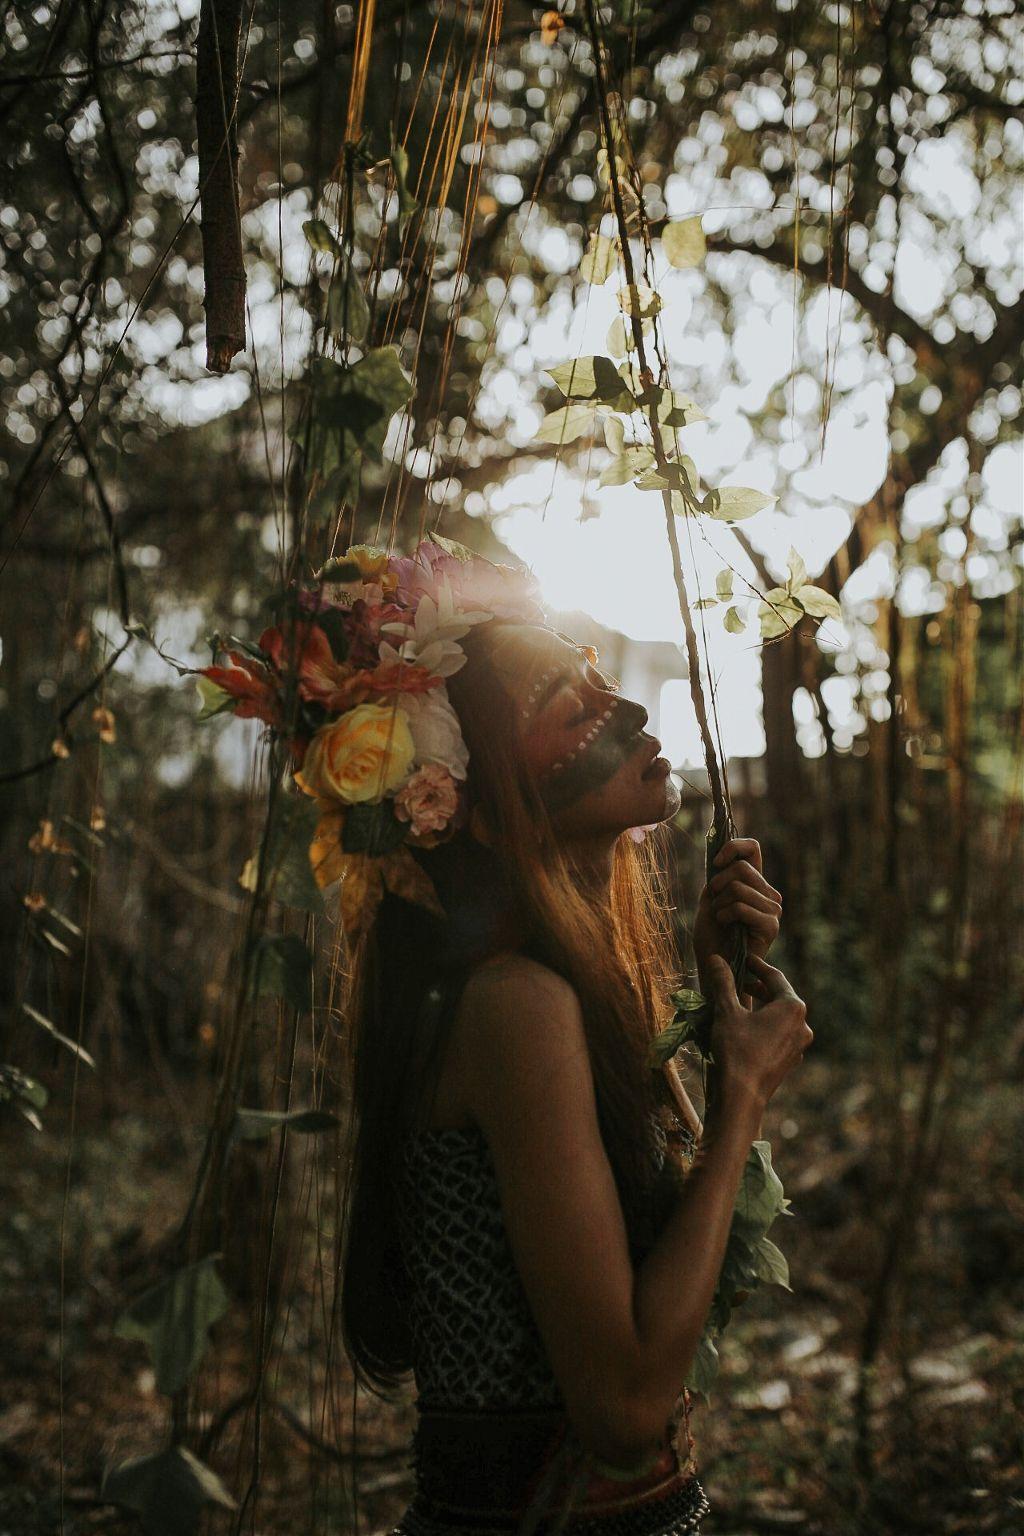 Beauty on forest   #freetoedit #collage  #emotions  #freetoedit  #photography  #followme  #picsart  #conseptphoto  #photographer  #interesting  #tandekphotoart #ubc_army #digitalart #photography #ilustration #beautifulwoman #followe #indonesiaphotography #Indonesia